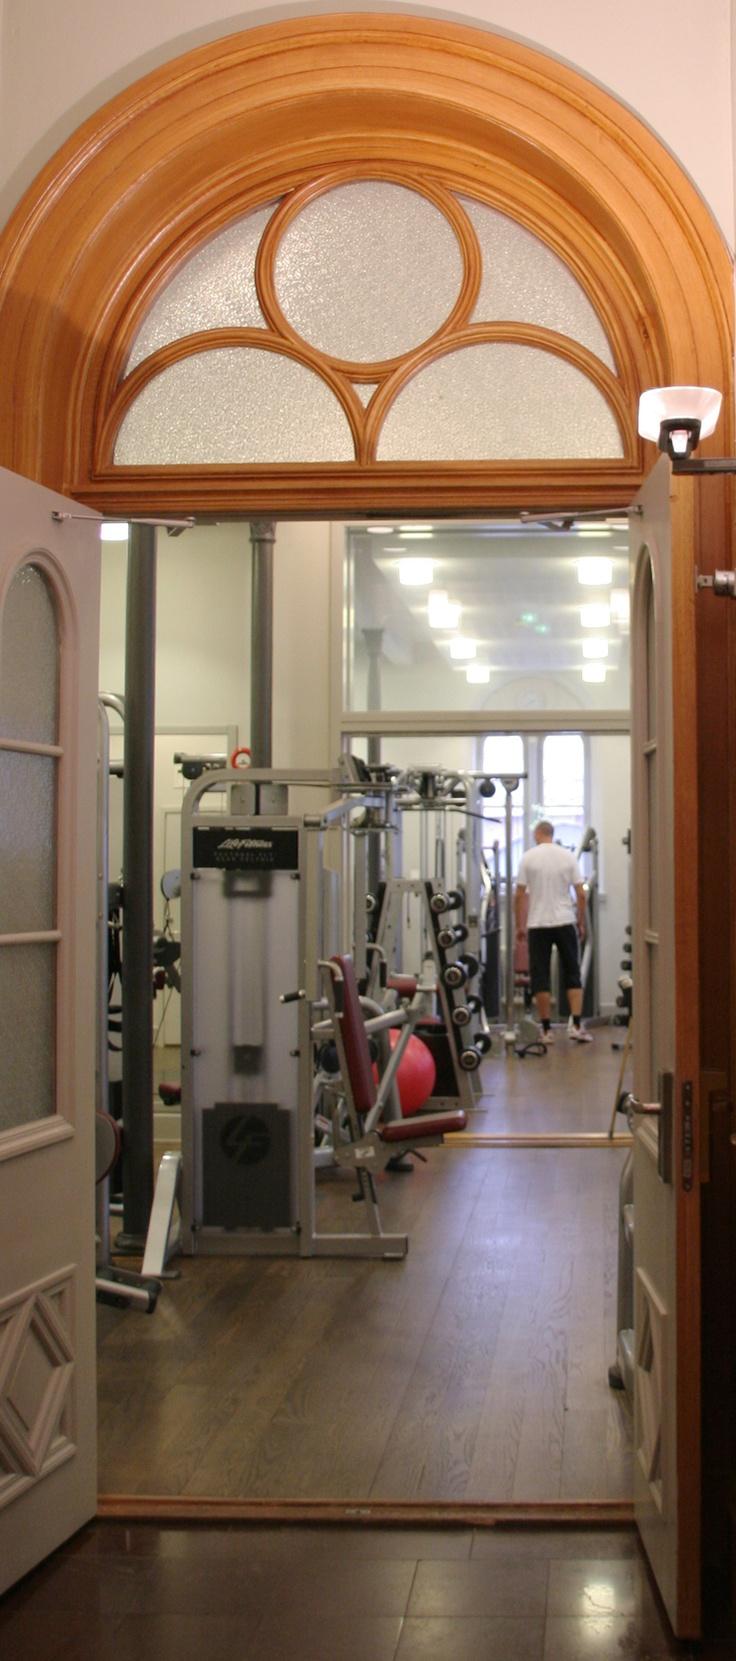 Hagabadet gym